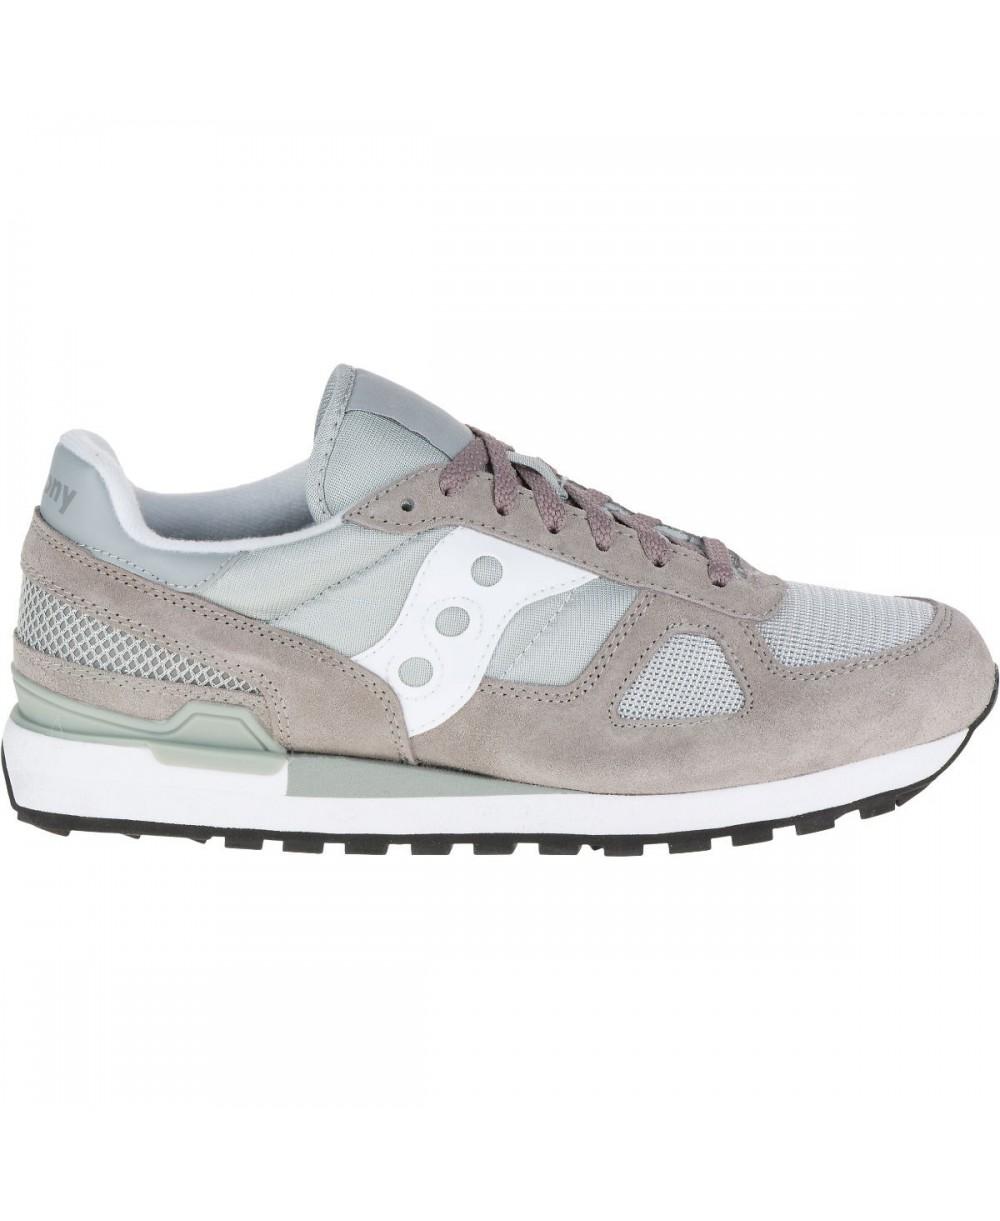 b12102c5 Men's Shadow Original Sneakers Shoes Gray/White